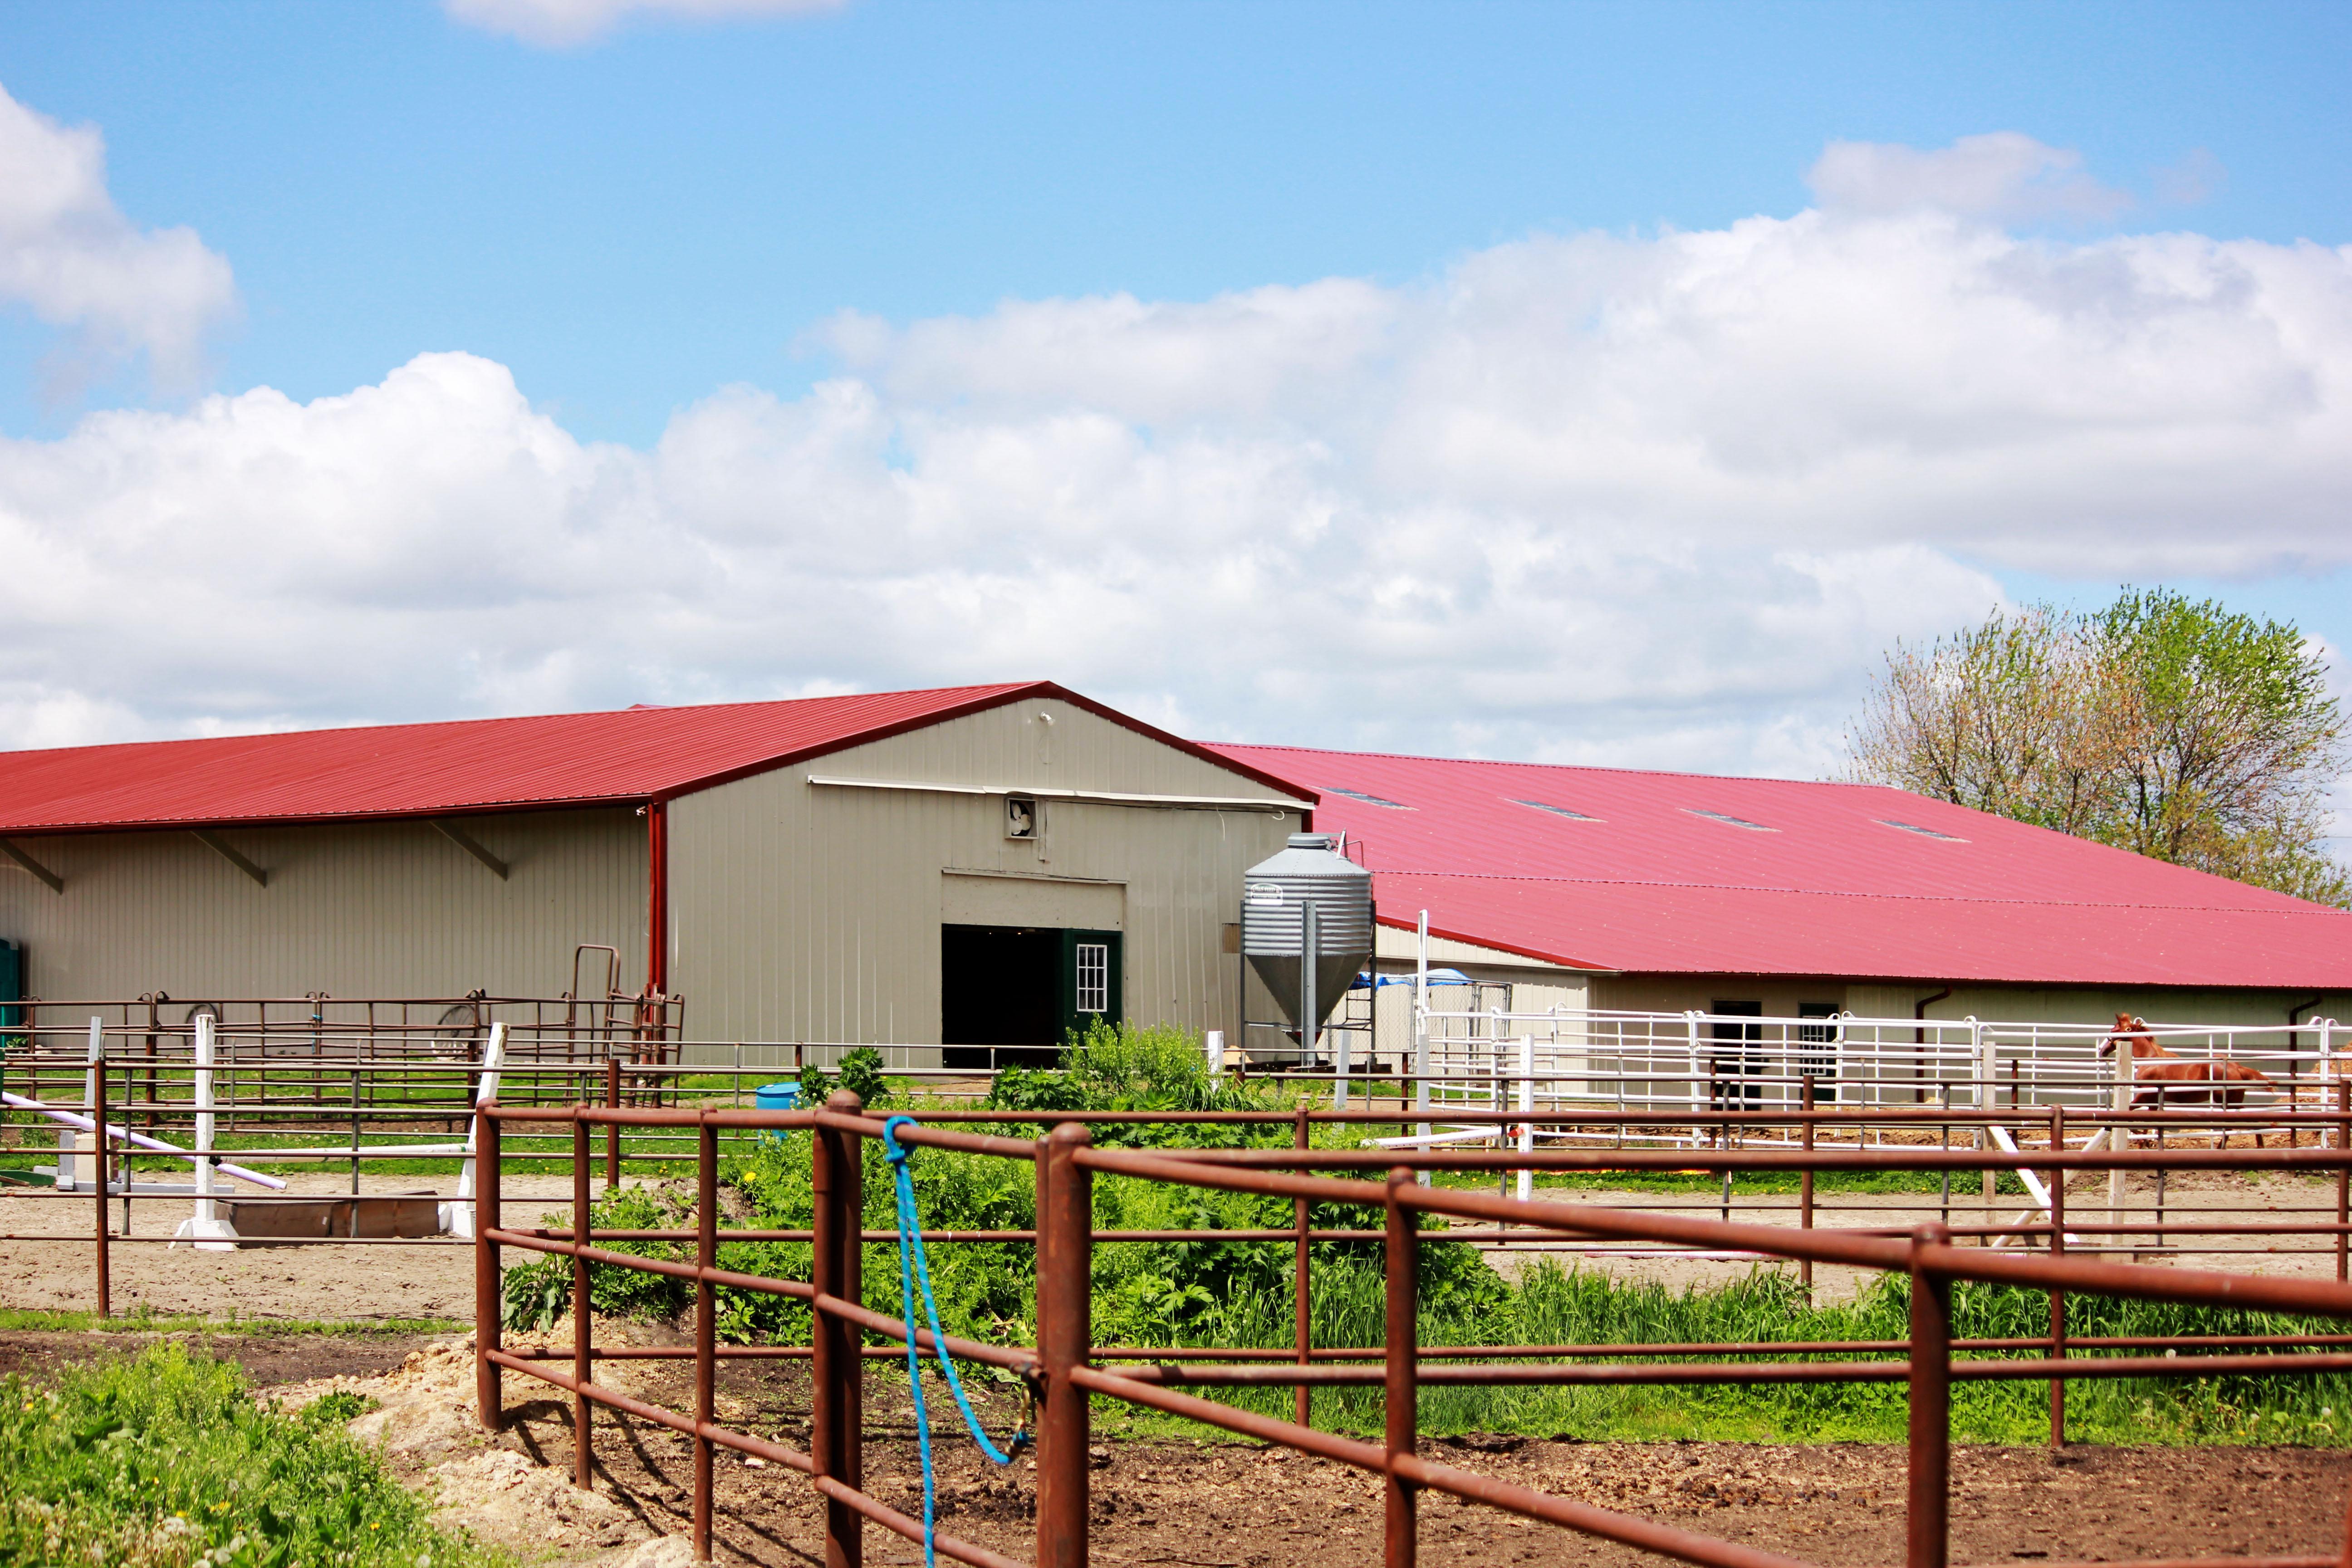 Barn 1 and 3